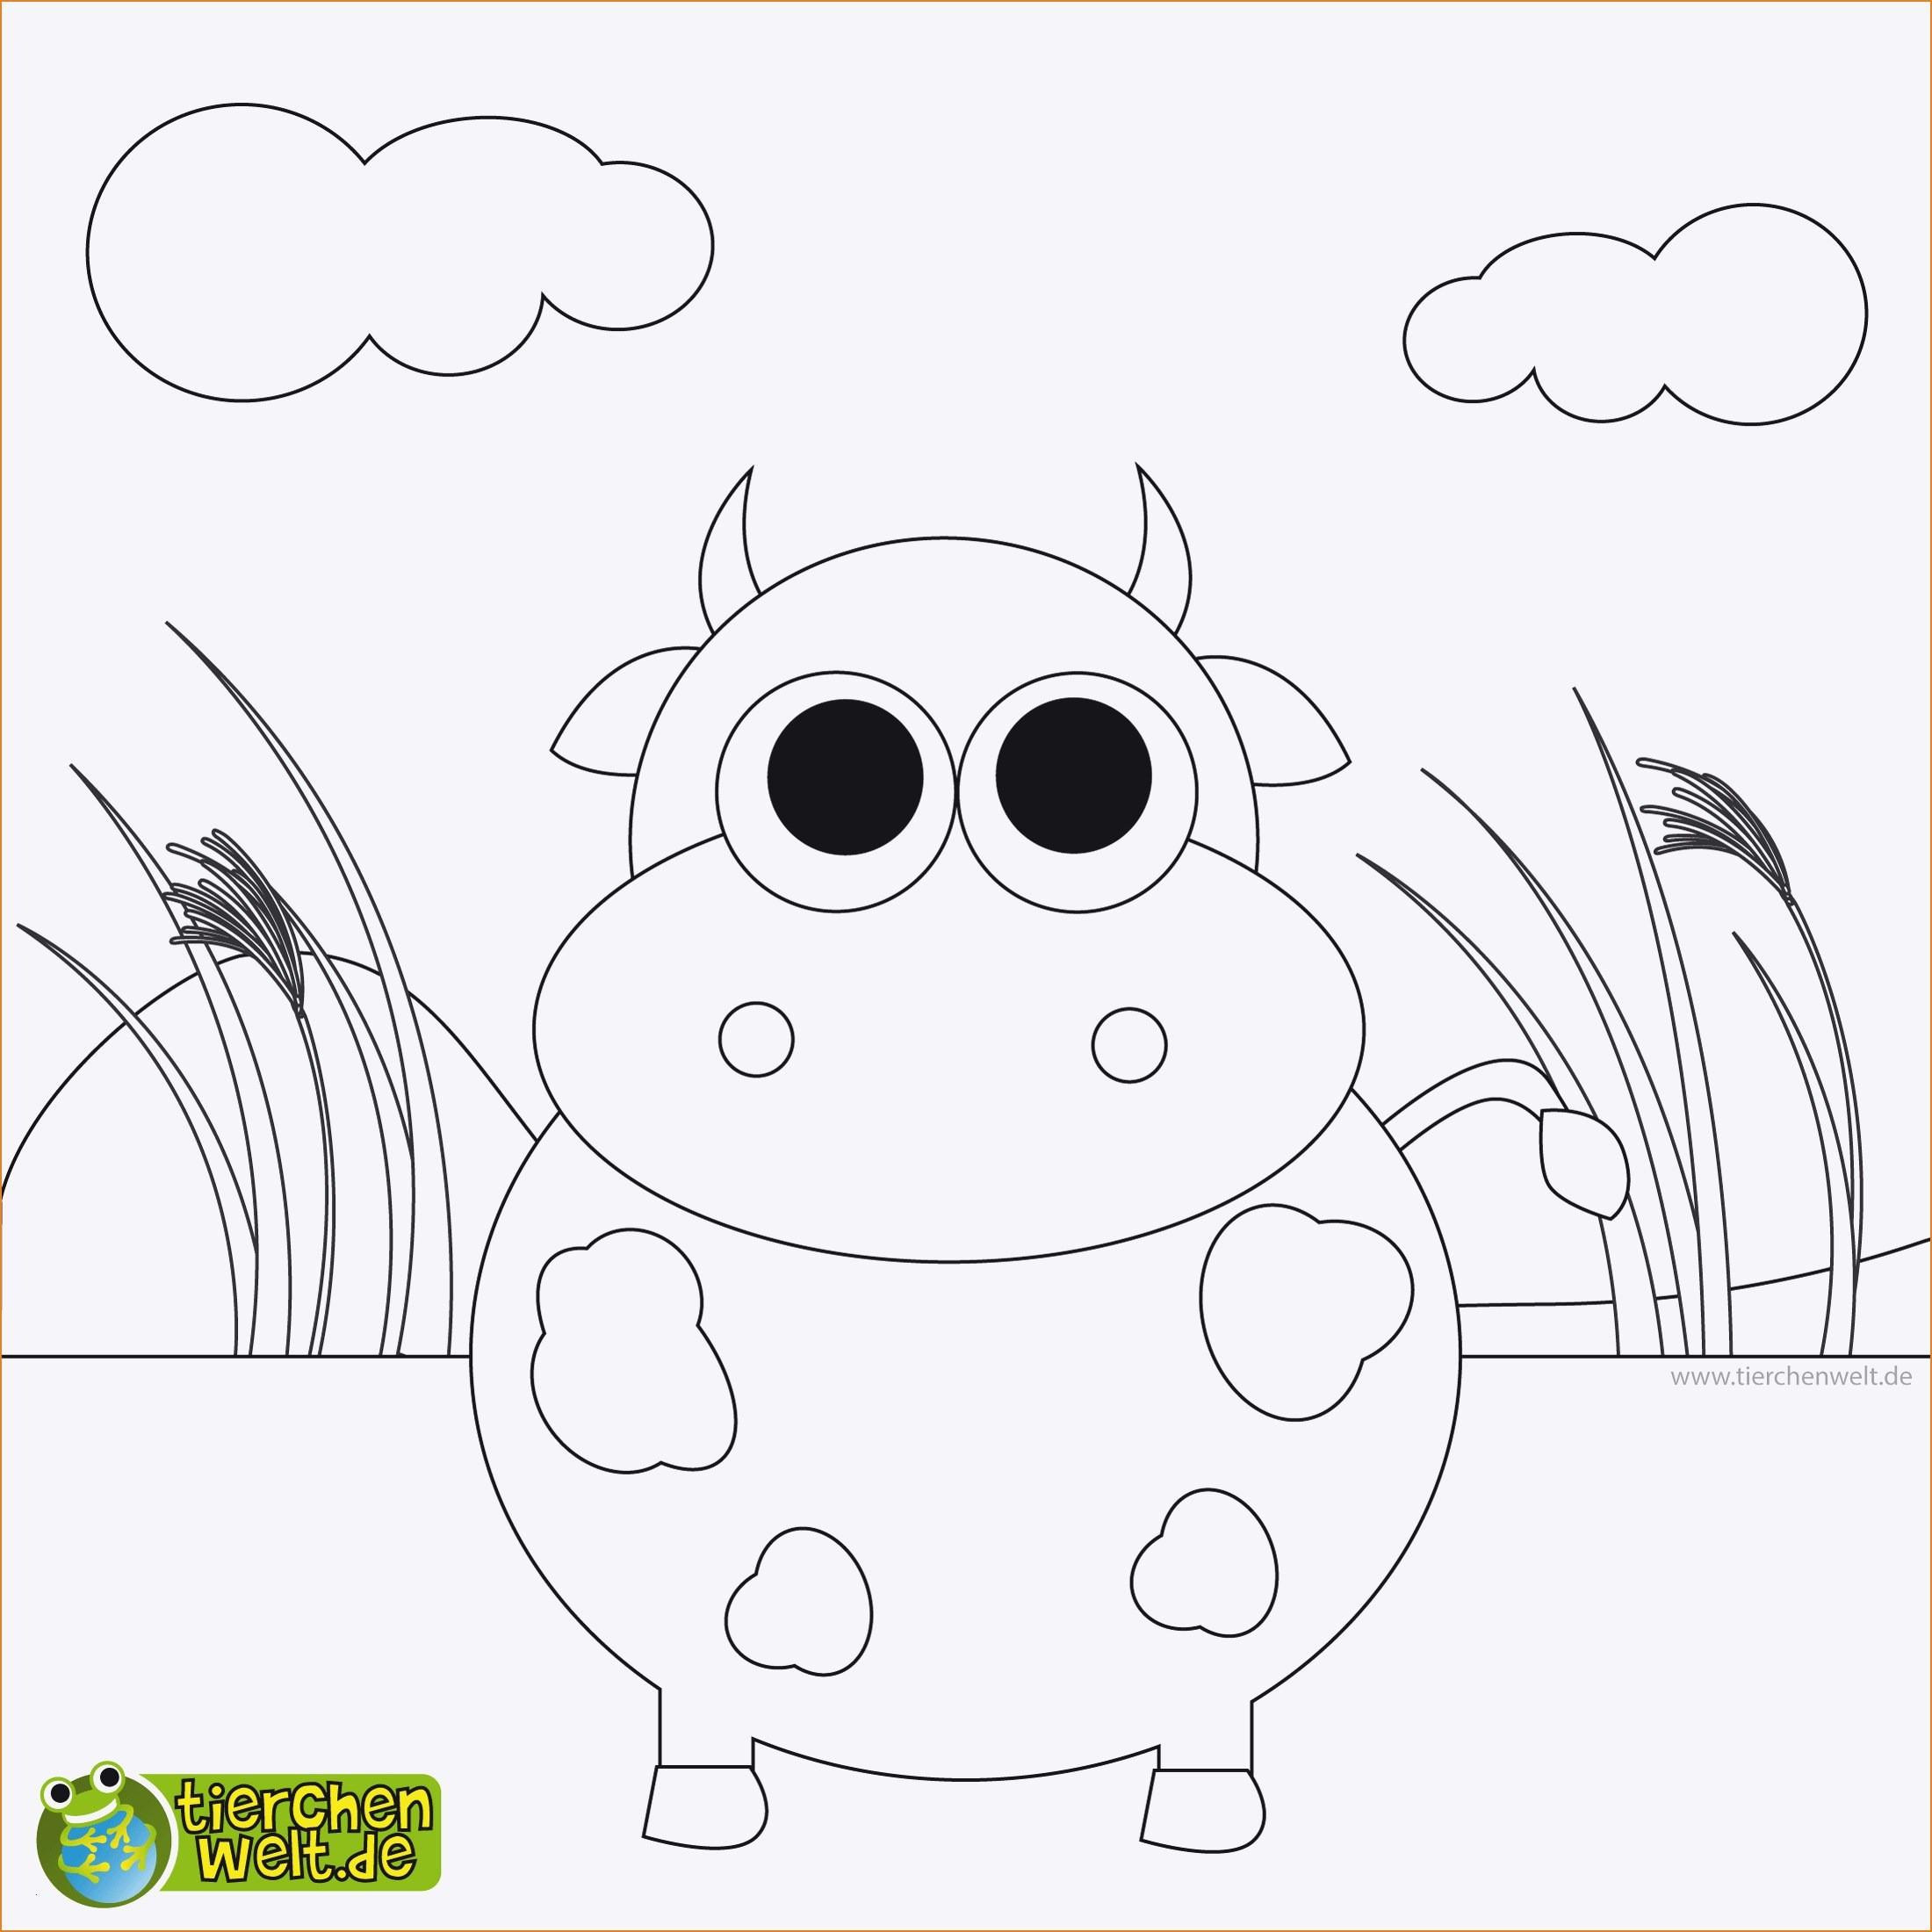 Ausmalbilder Angry Birds Einzigartig 40 Ausmalbilder Emoji Scoredatscore Genial Ausmalbilder Angry Birds Fotos